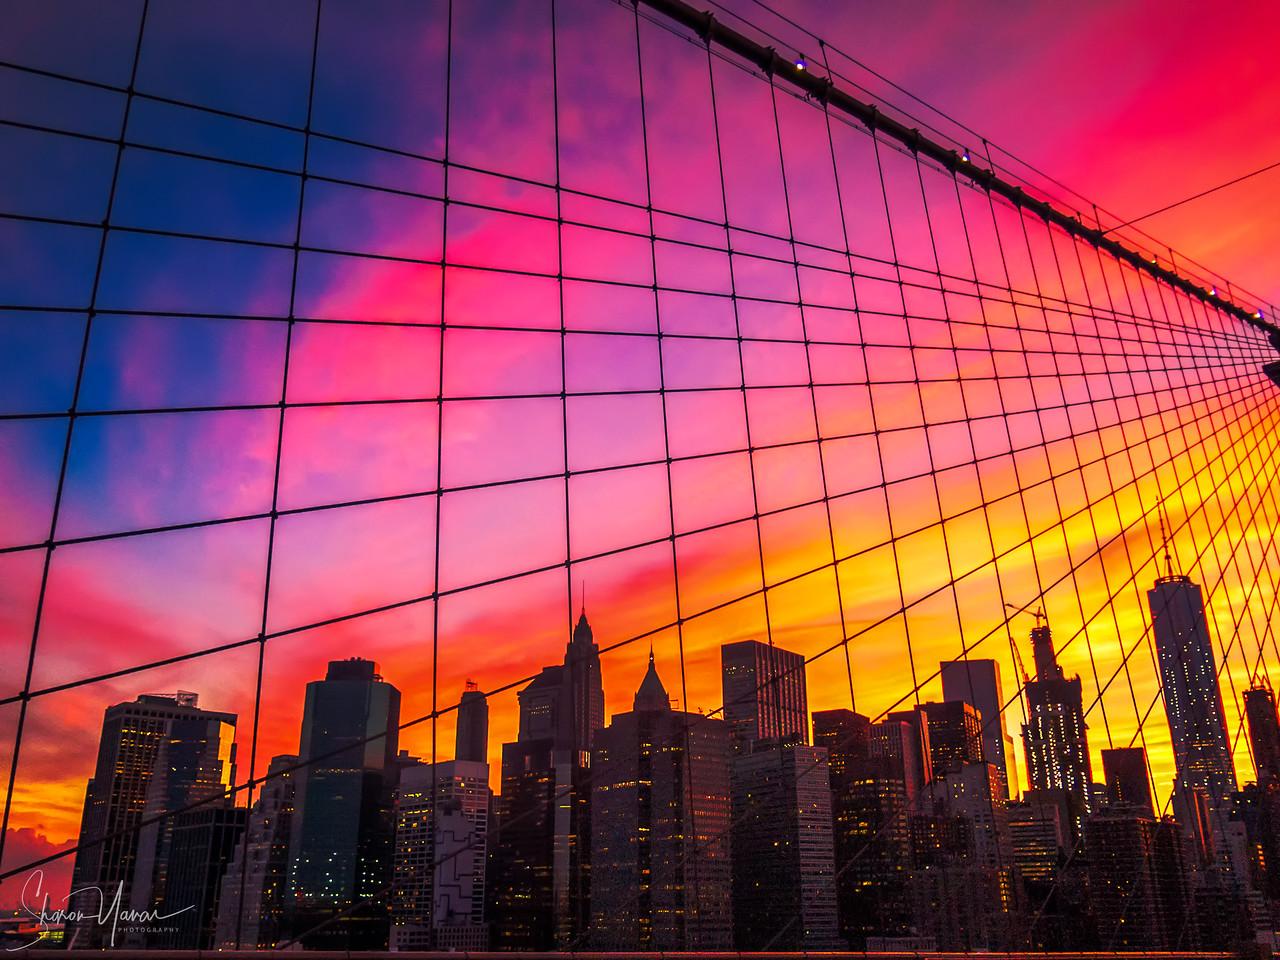 View of Manhattan at sunset from Brooklyn Bridge